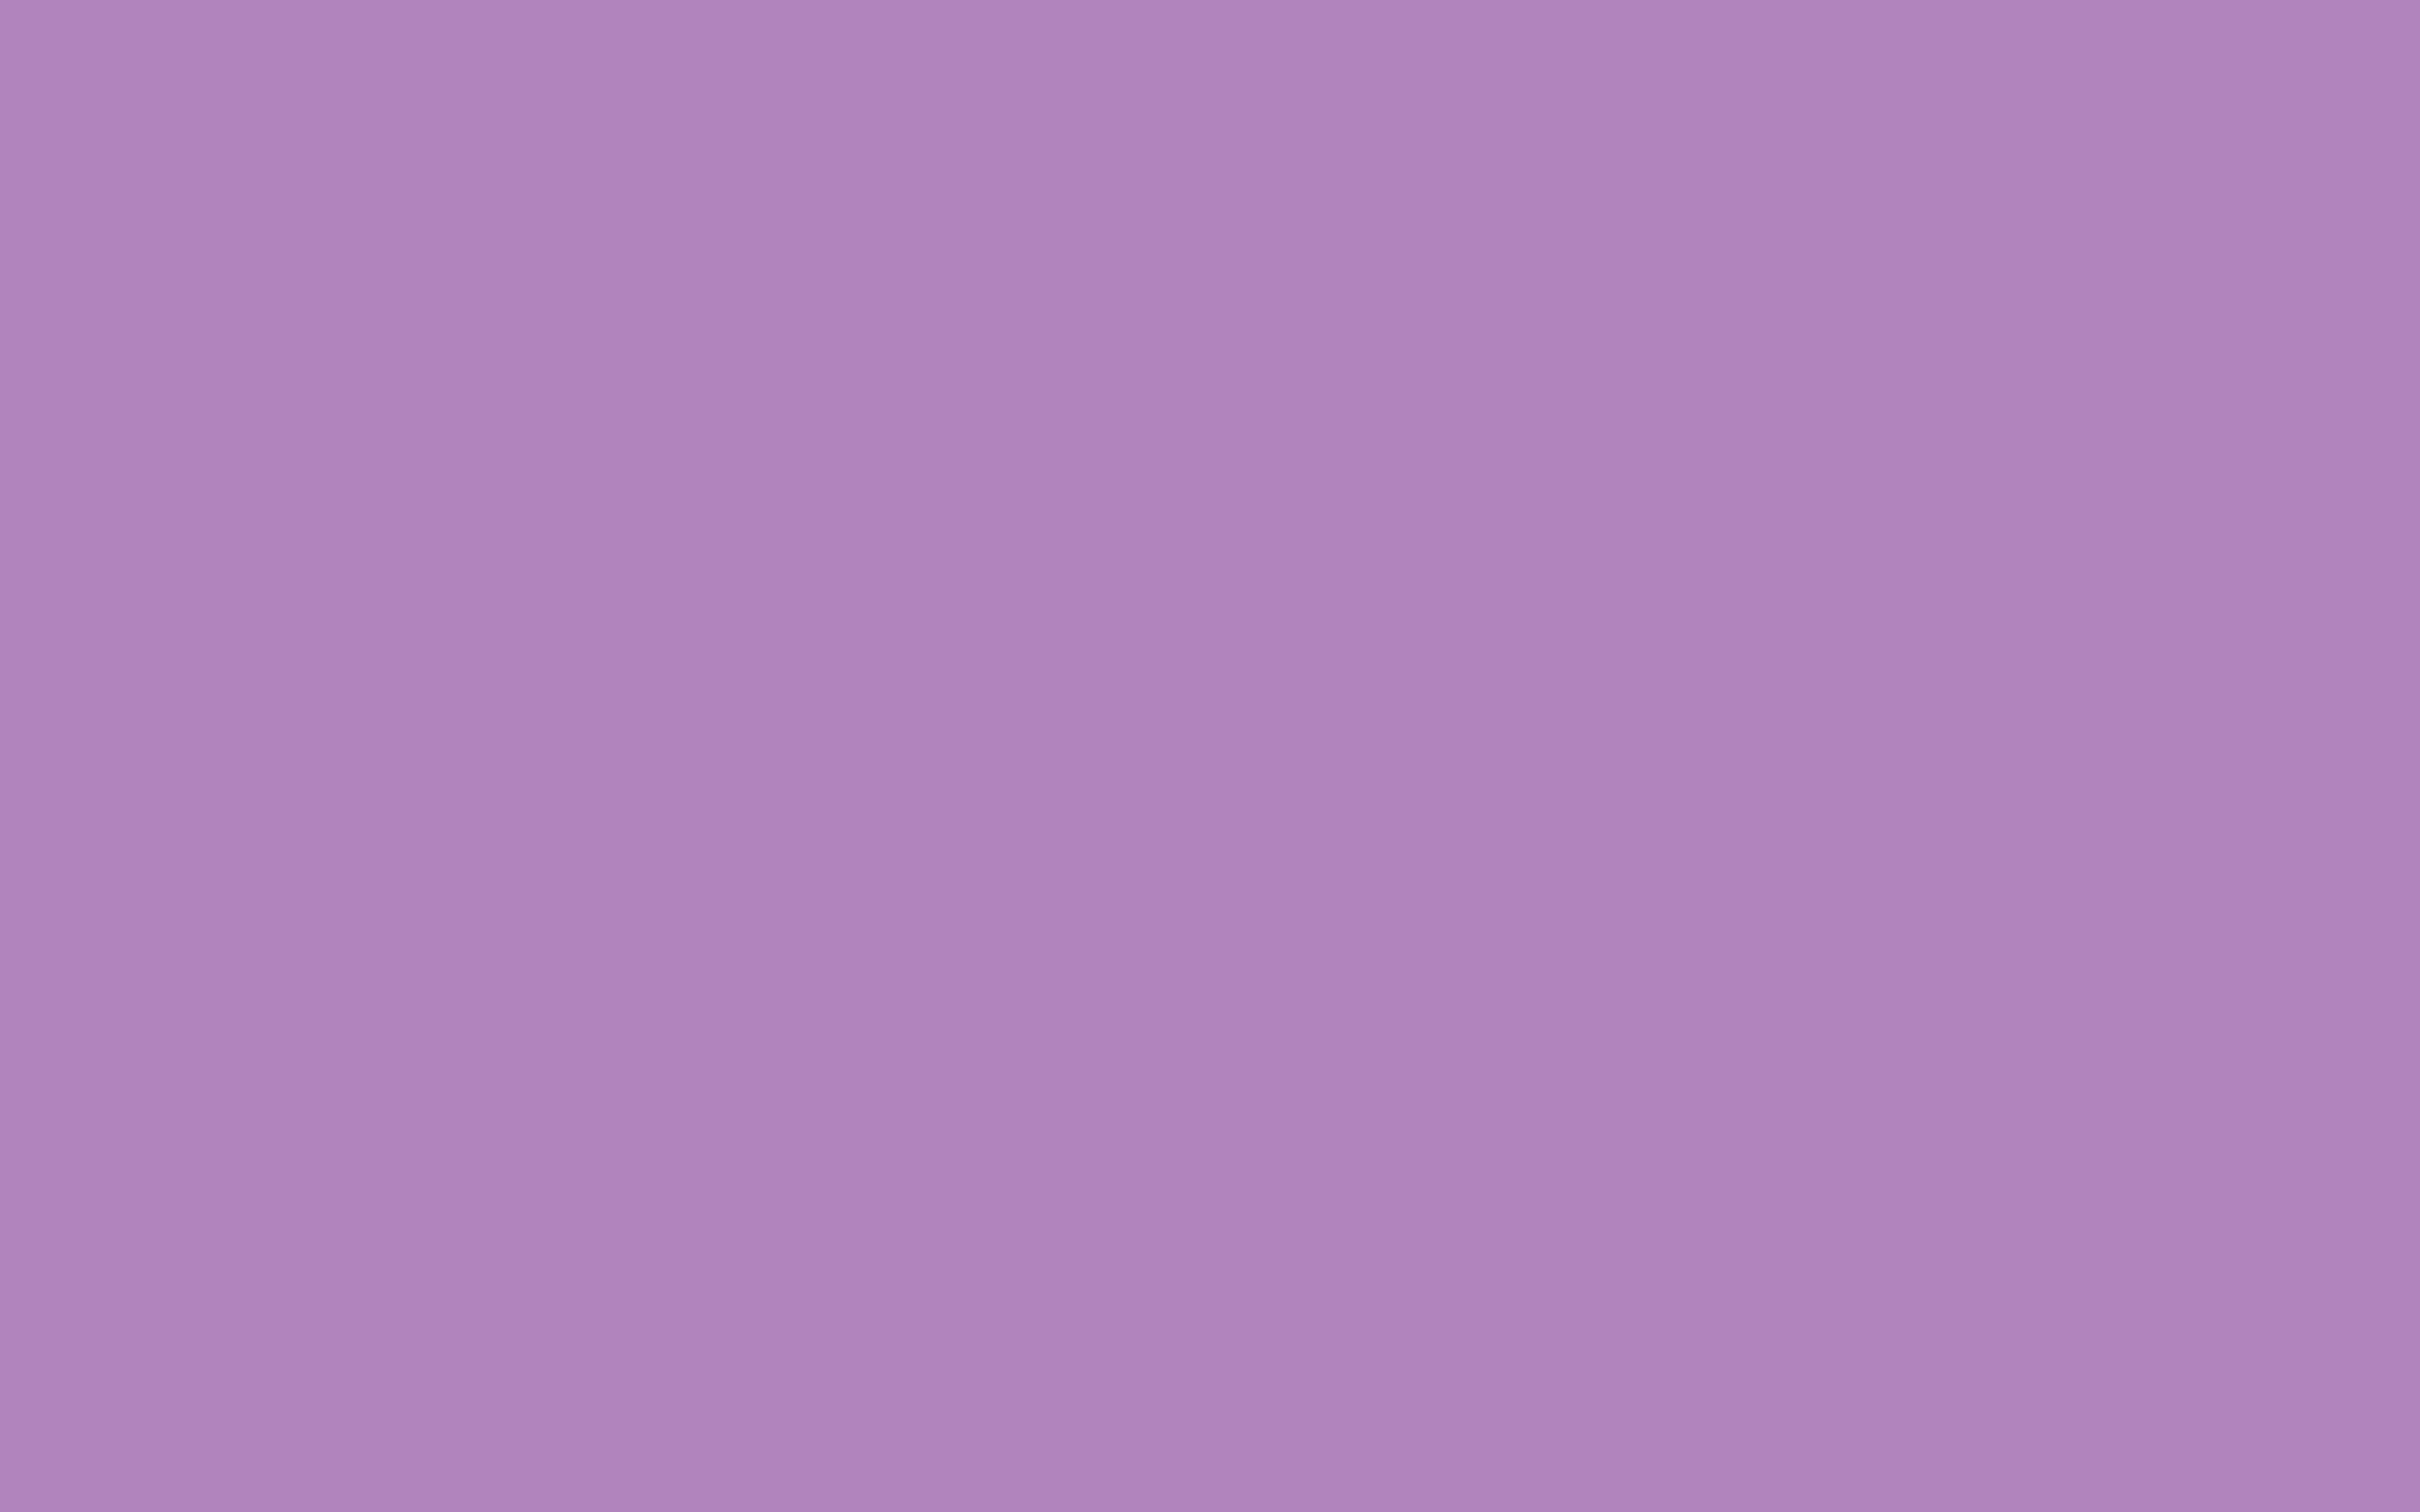 2560x1600 African Violet Solid Color Background